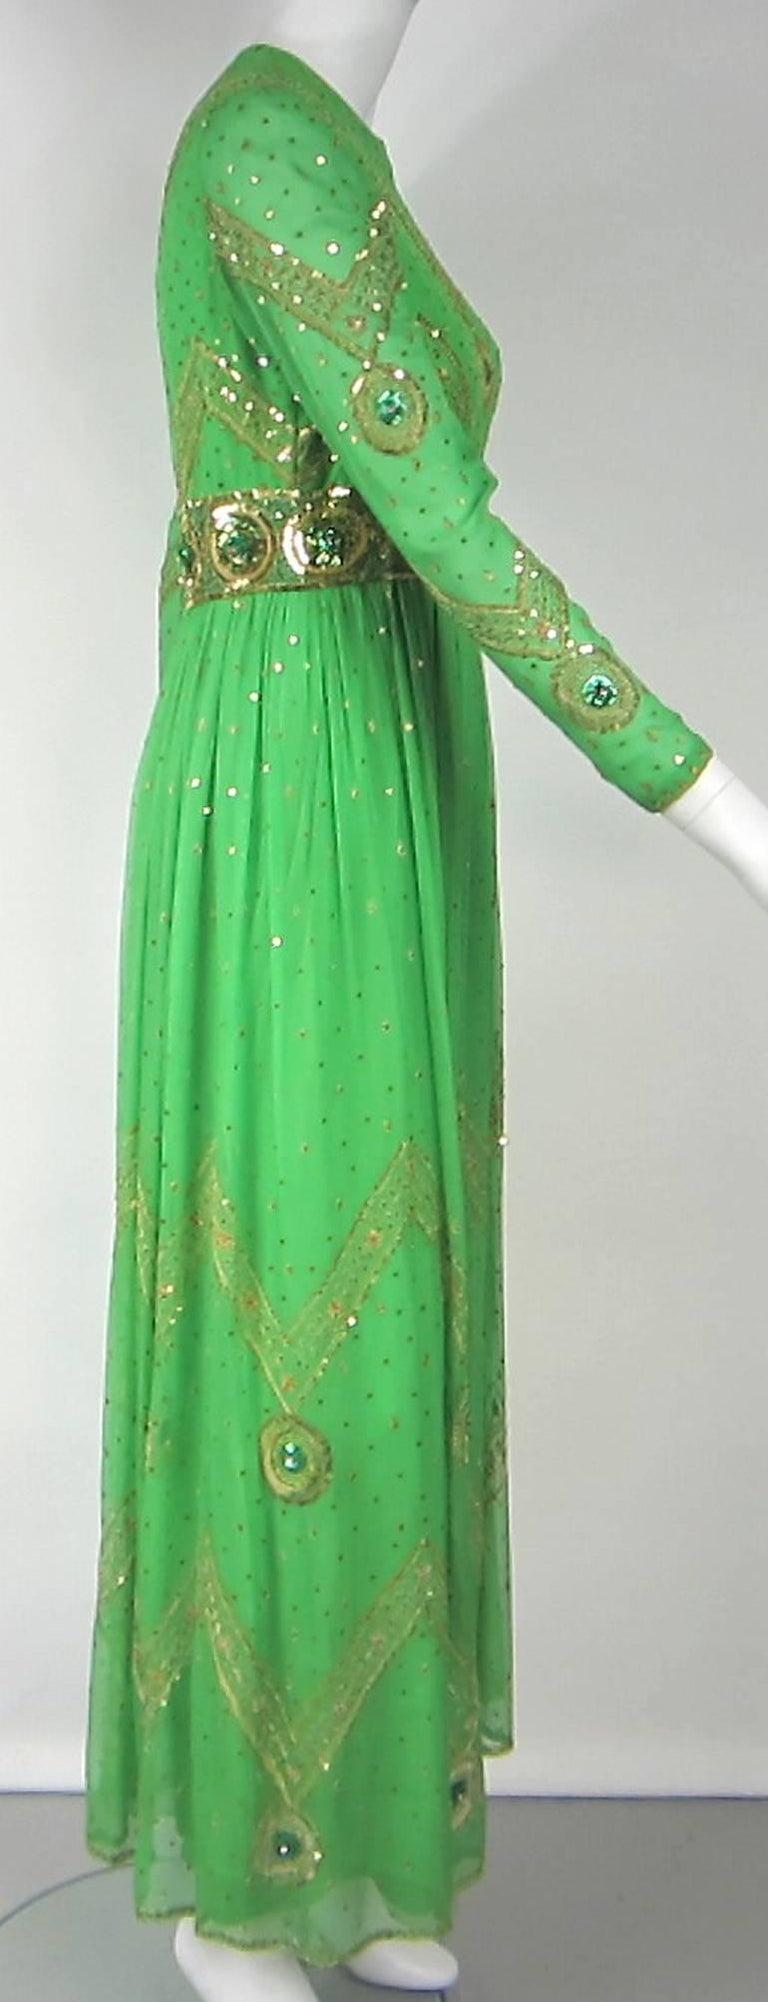 Saz Surjit & Adash Gill Gown Beaded Silk Dress 1970s For Sale 2